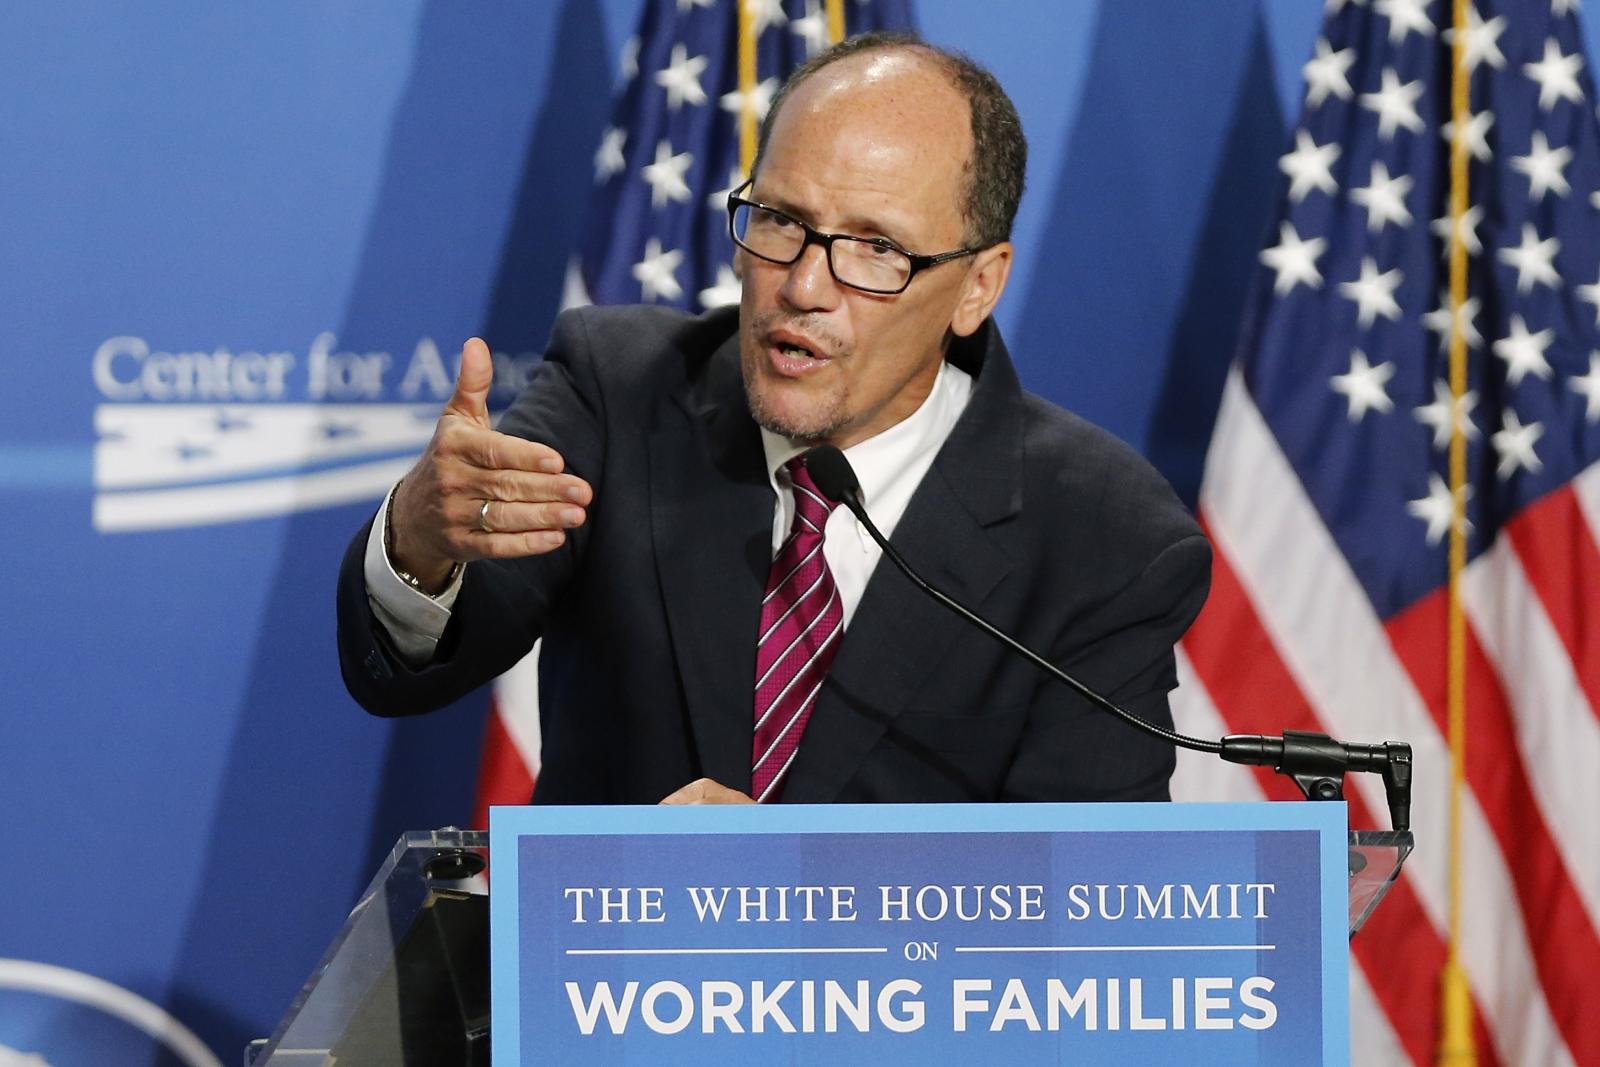 The DNC Elects Pro-TPP Establishment Democrat As Its New Chairman